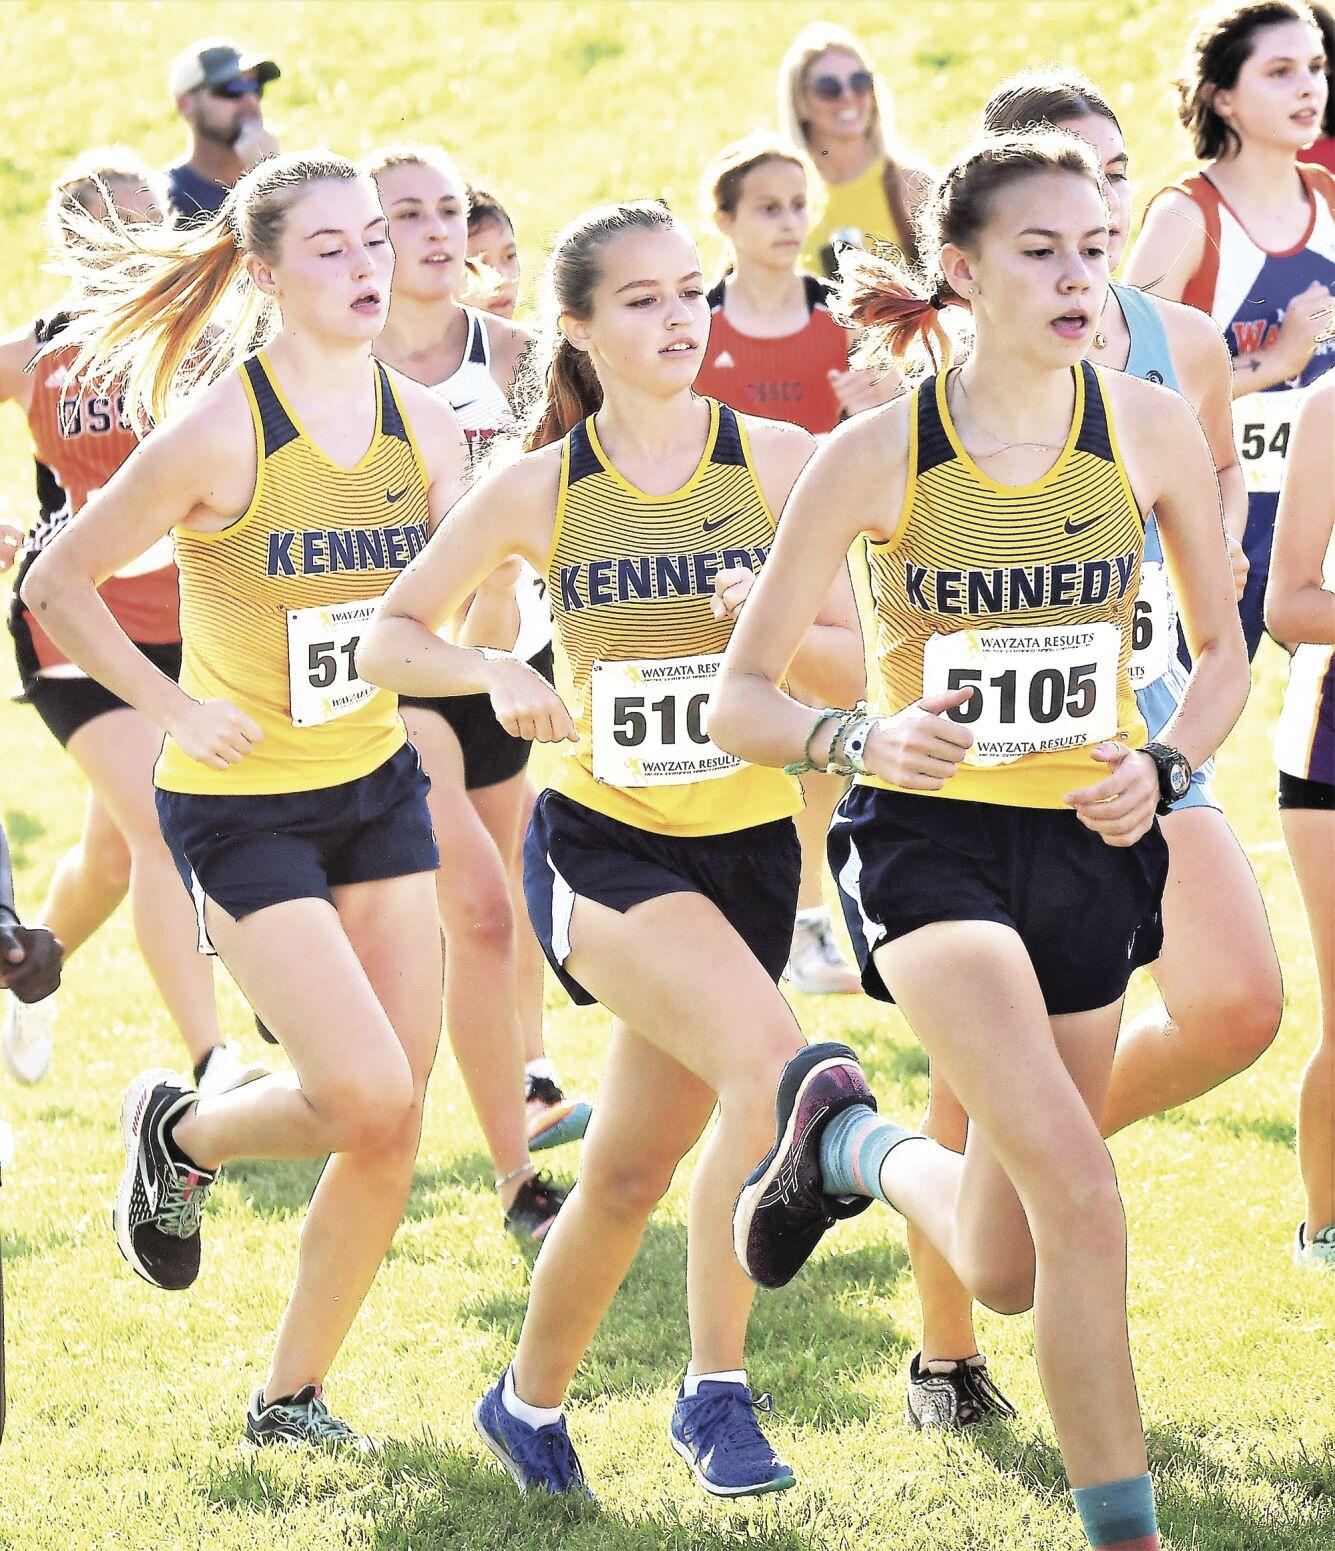 Kennedy runners